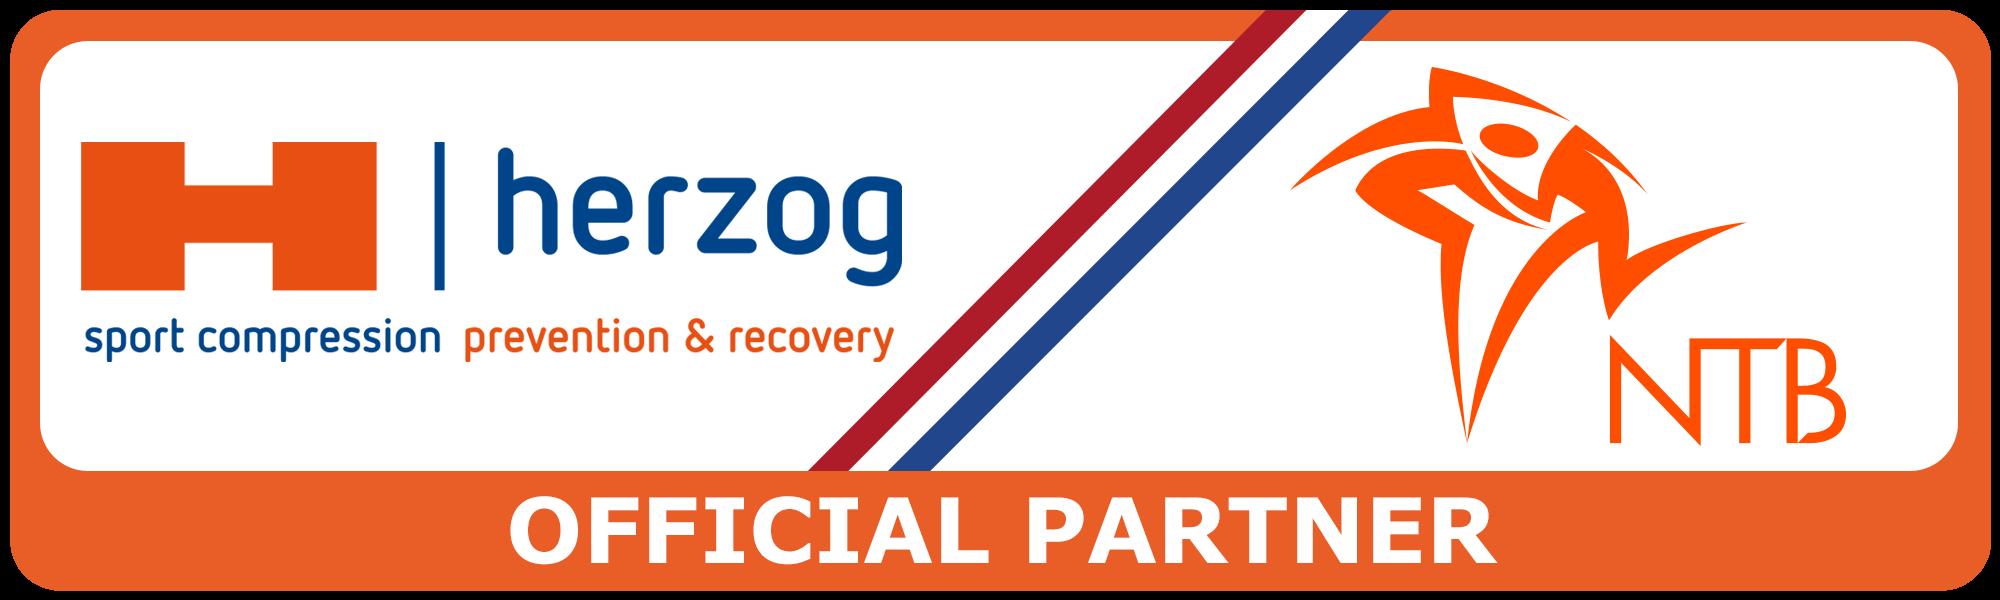 Herzog_Medical_NTB